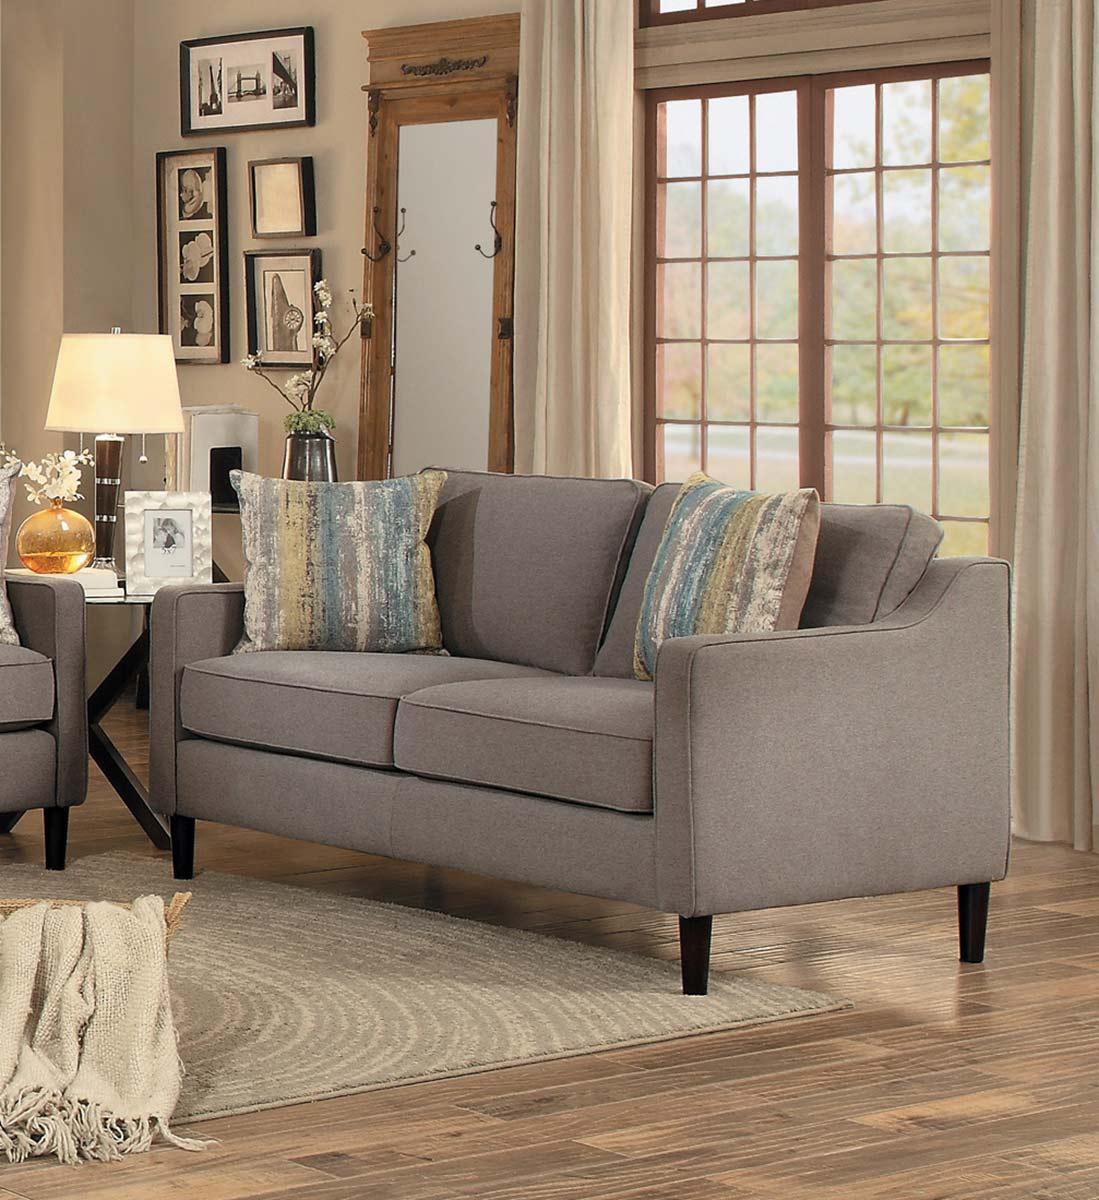 Homelegance Lotte Love Seat - Brown Fabric